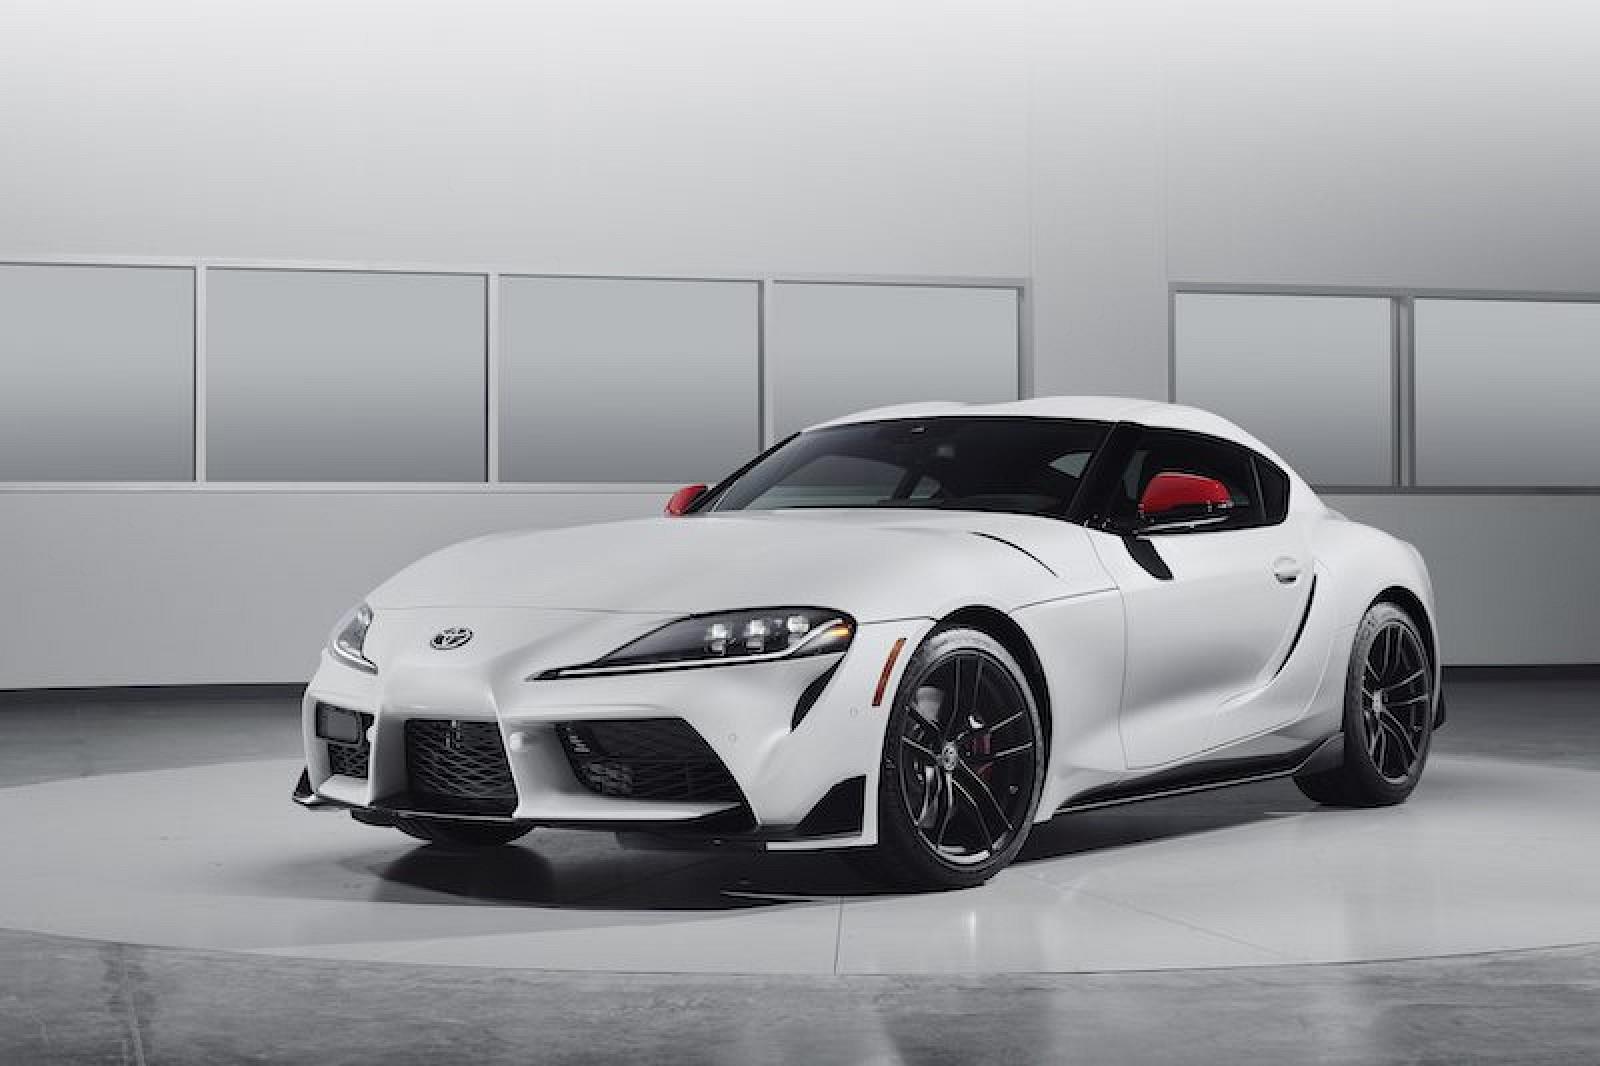 2020 Toyota Supra Features Wireless Carplay Macrumors